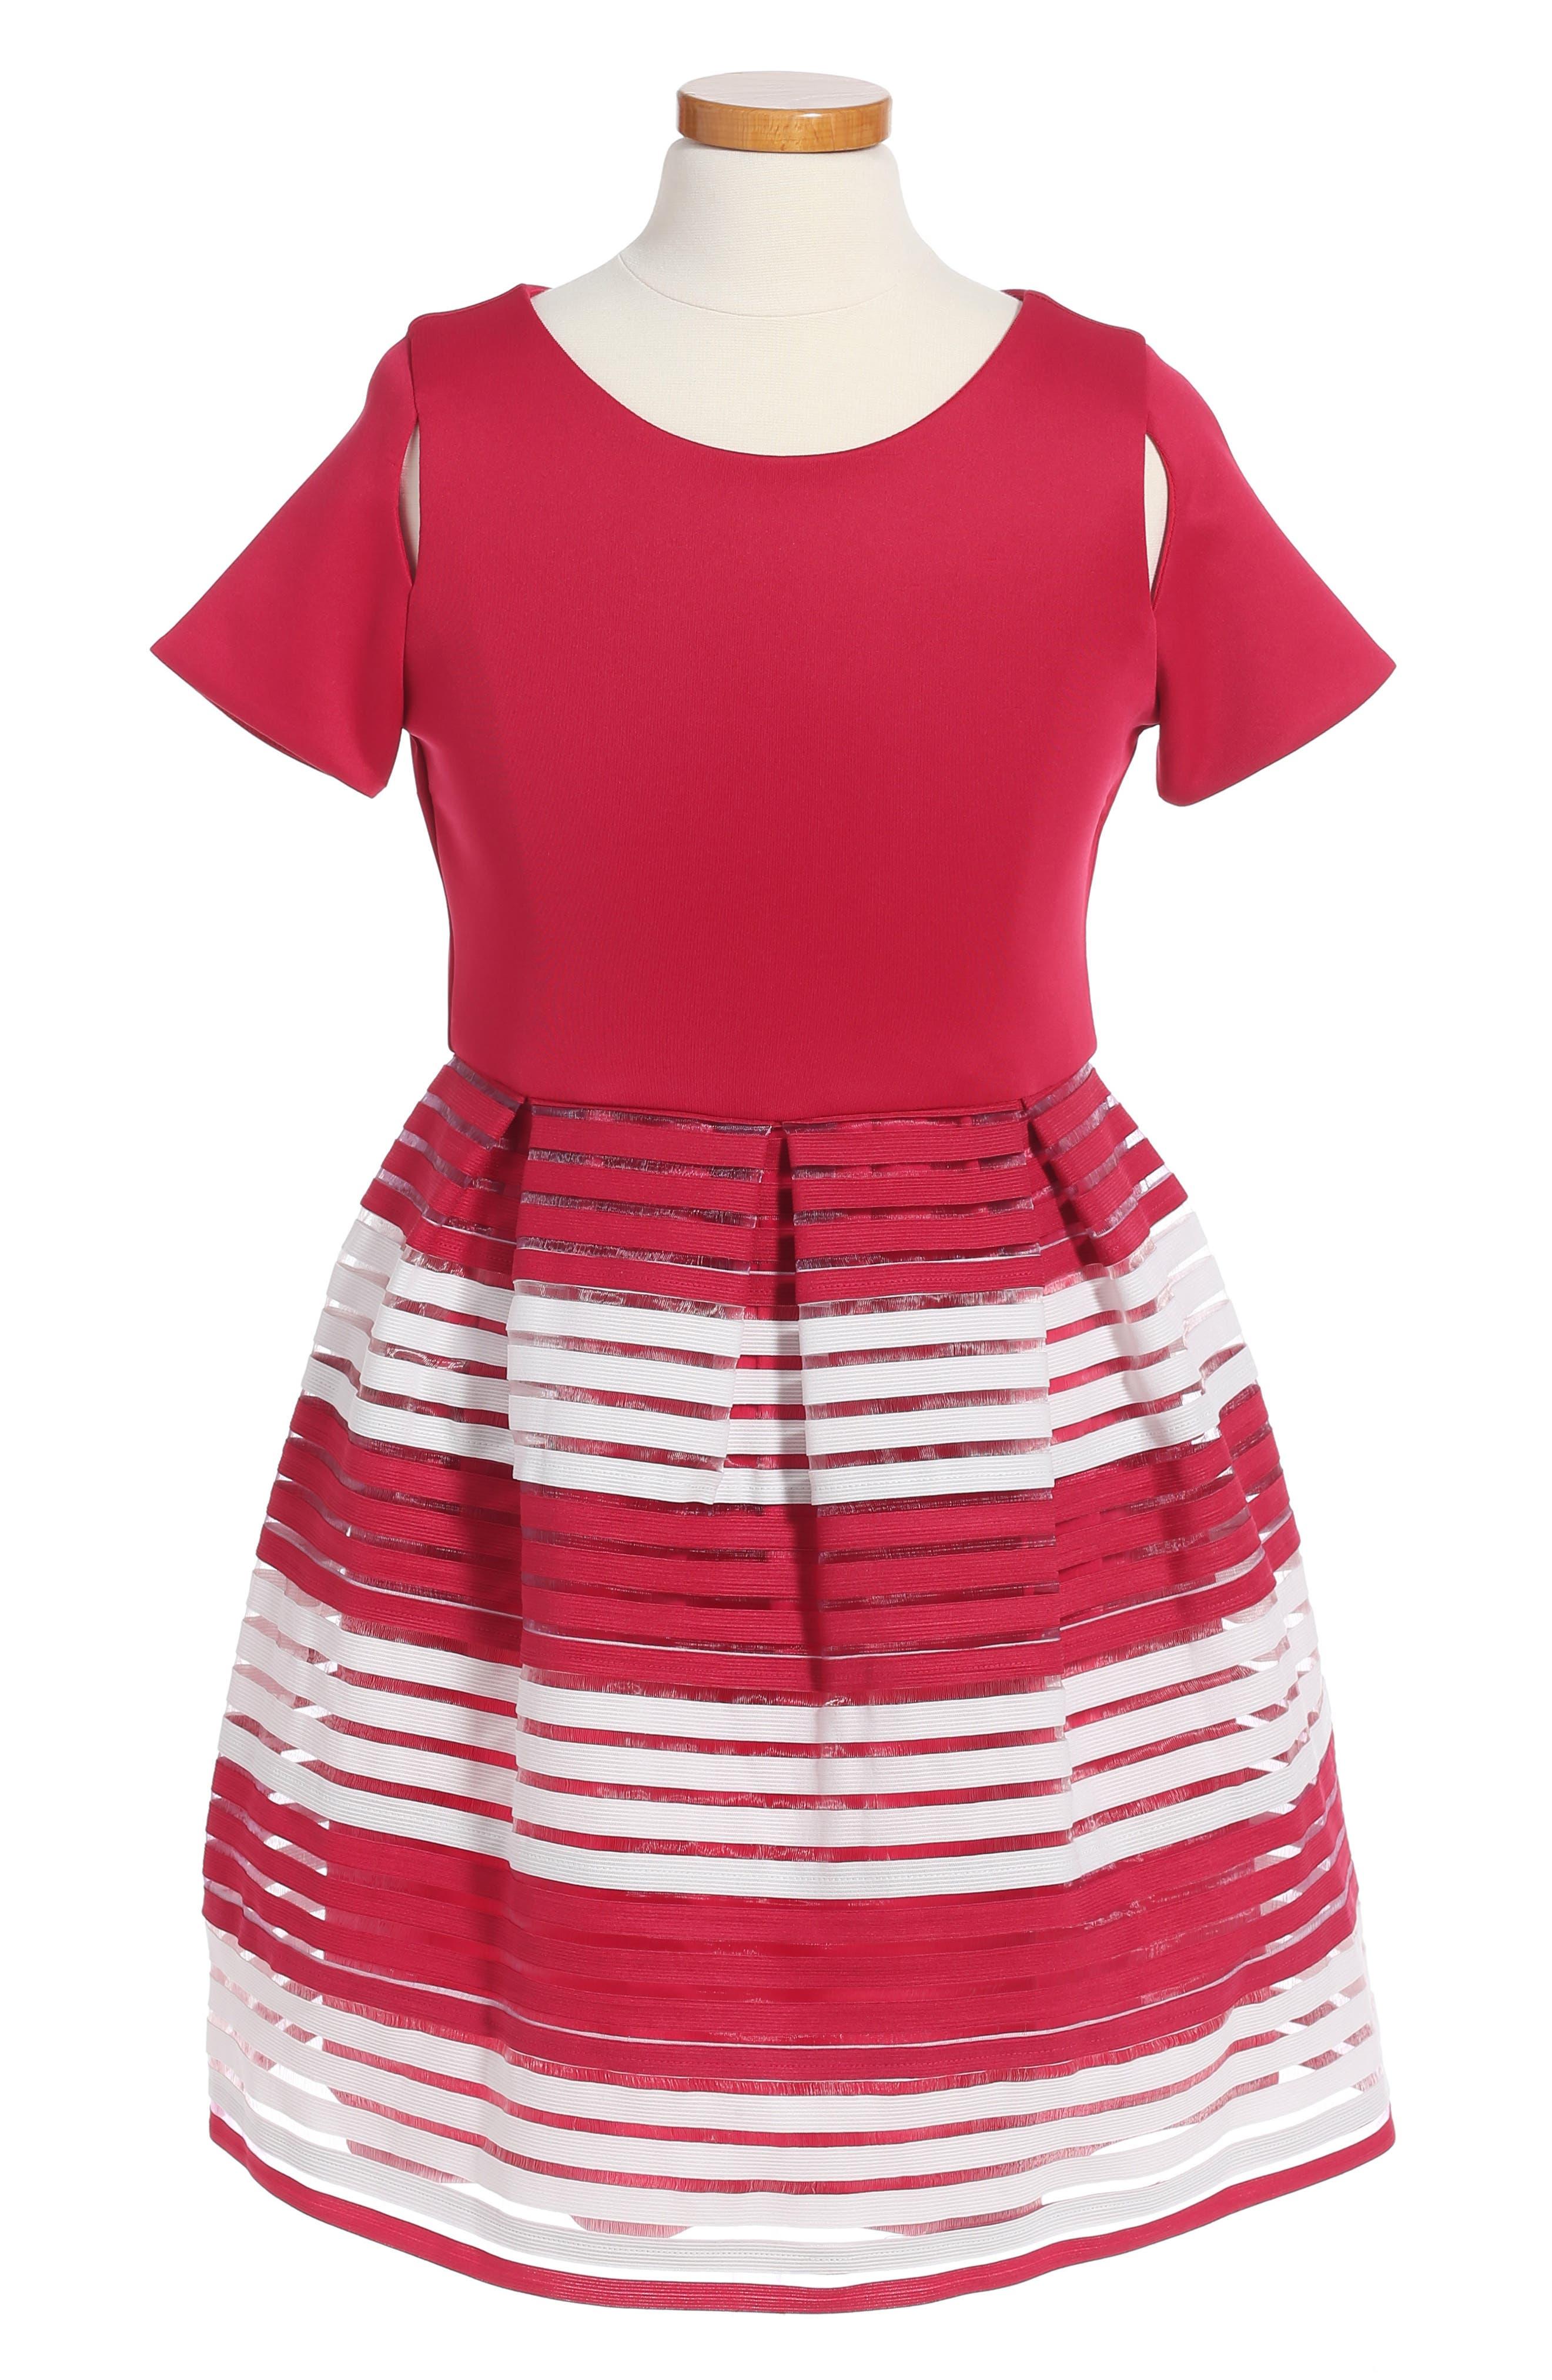 BLUSH by US Angels Elastic Stripe Dress (Big Girls)